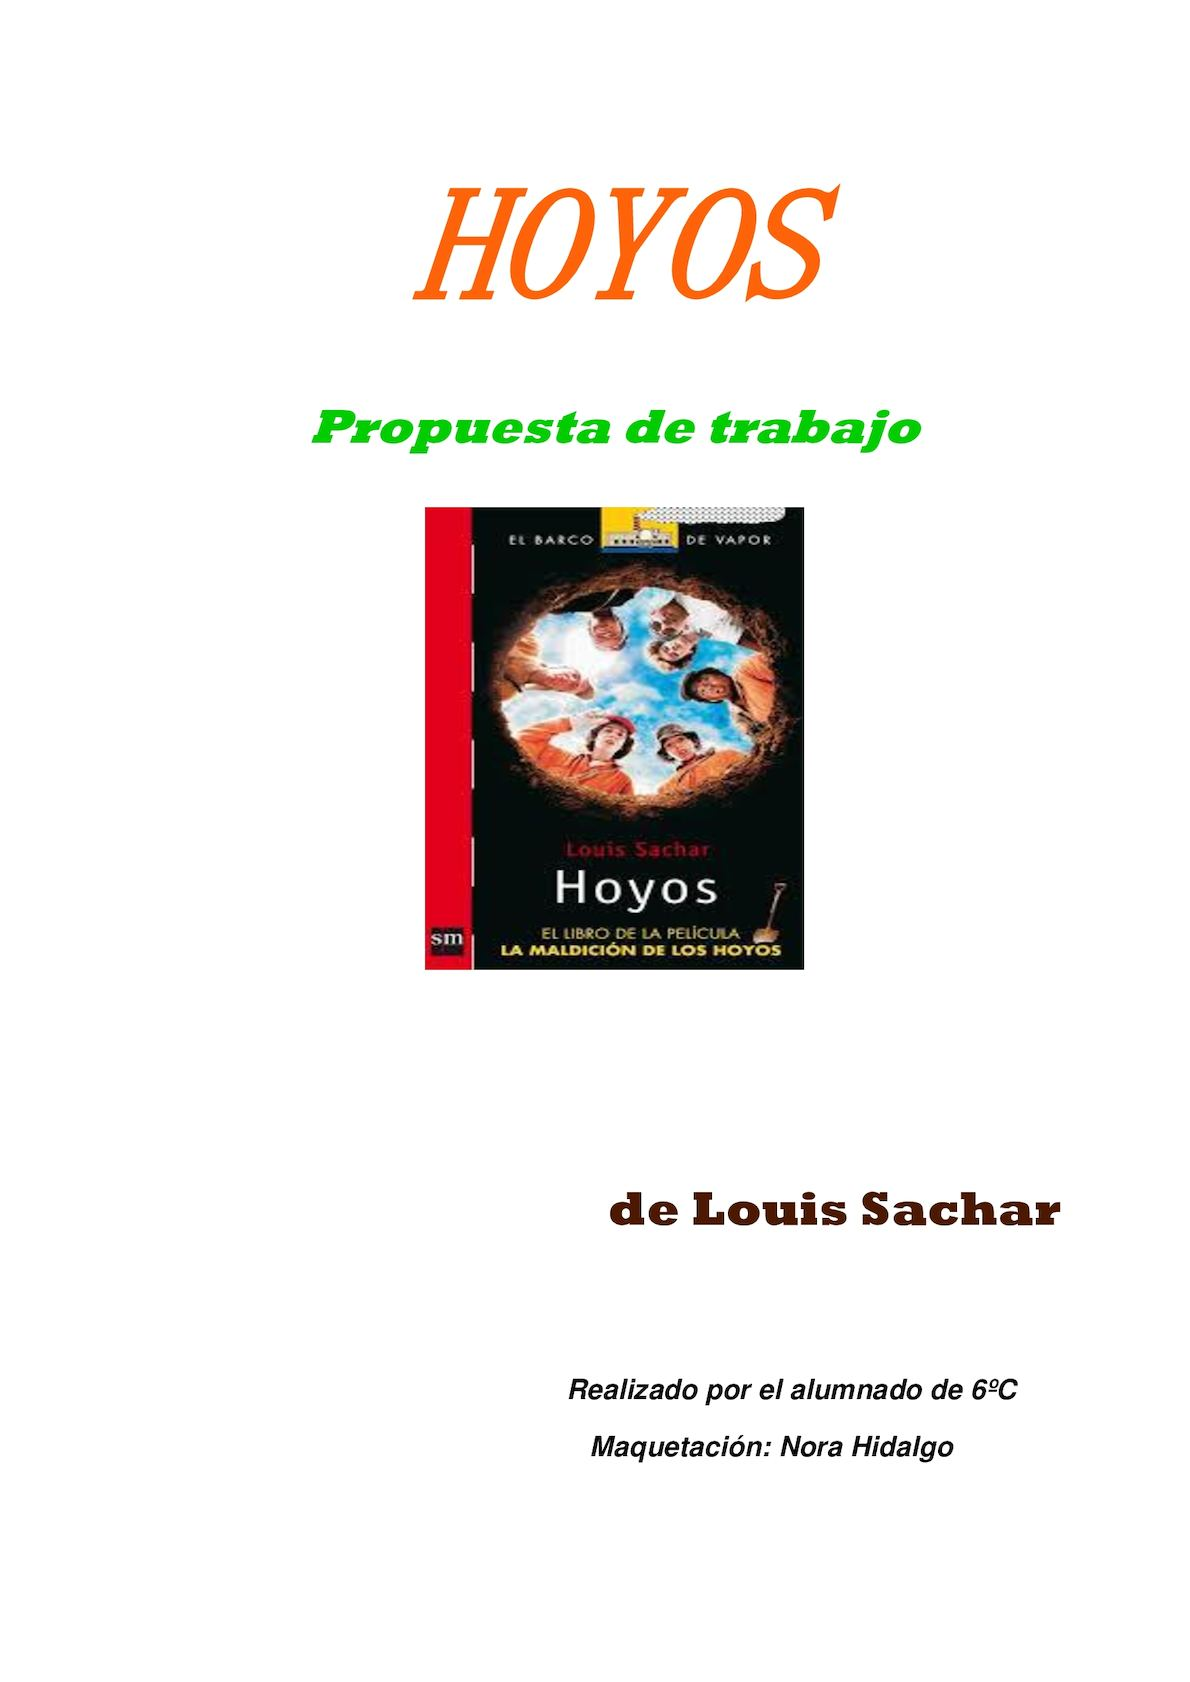 Hoyos De Louis Sachar Calameo Downloader